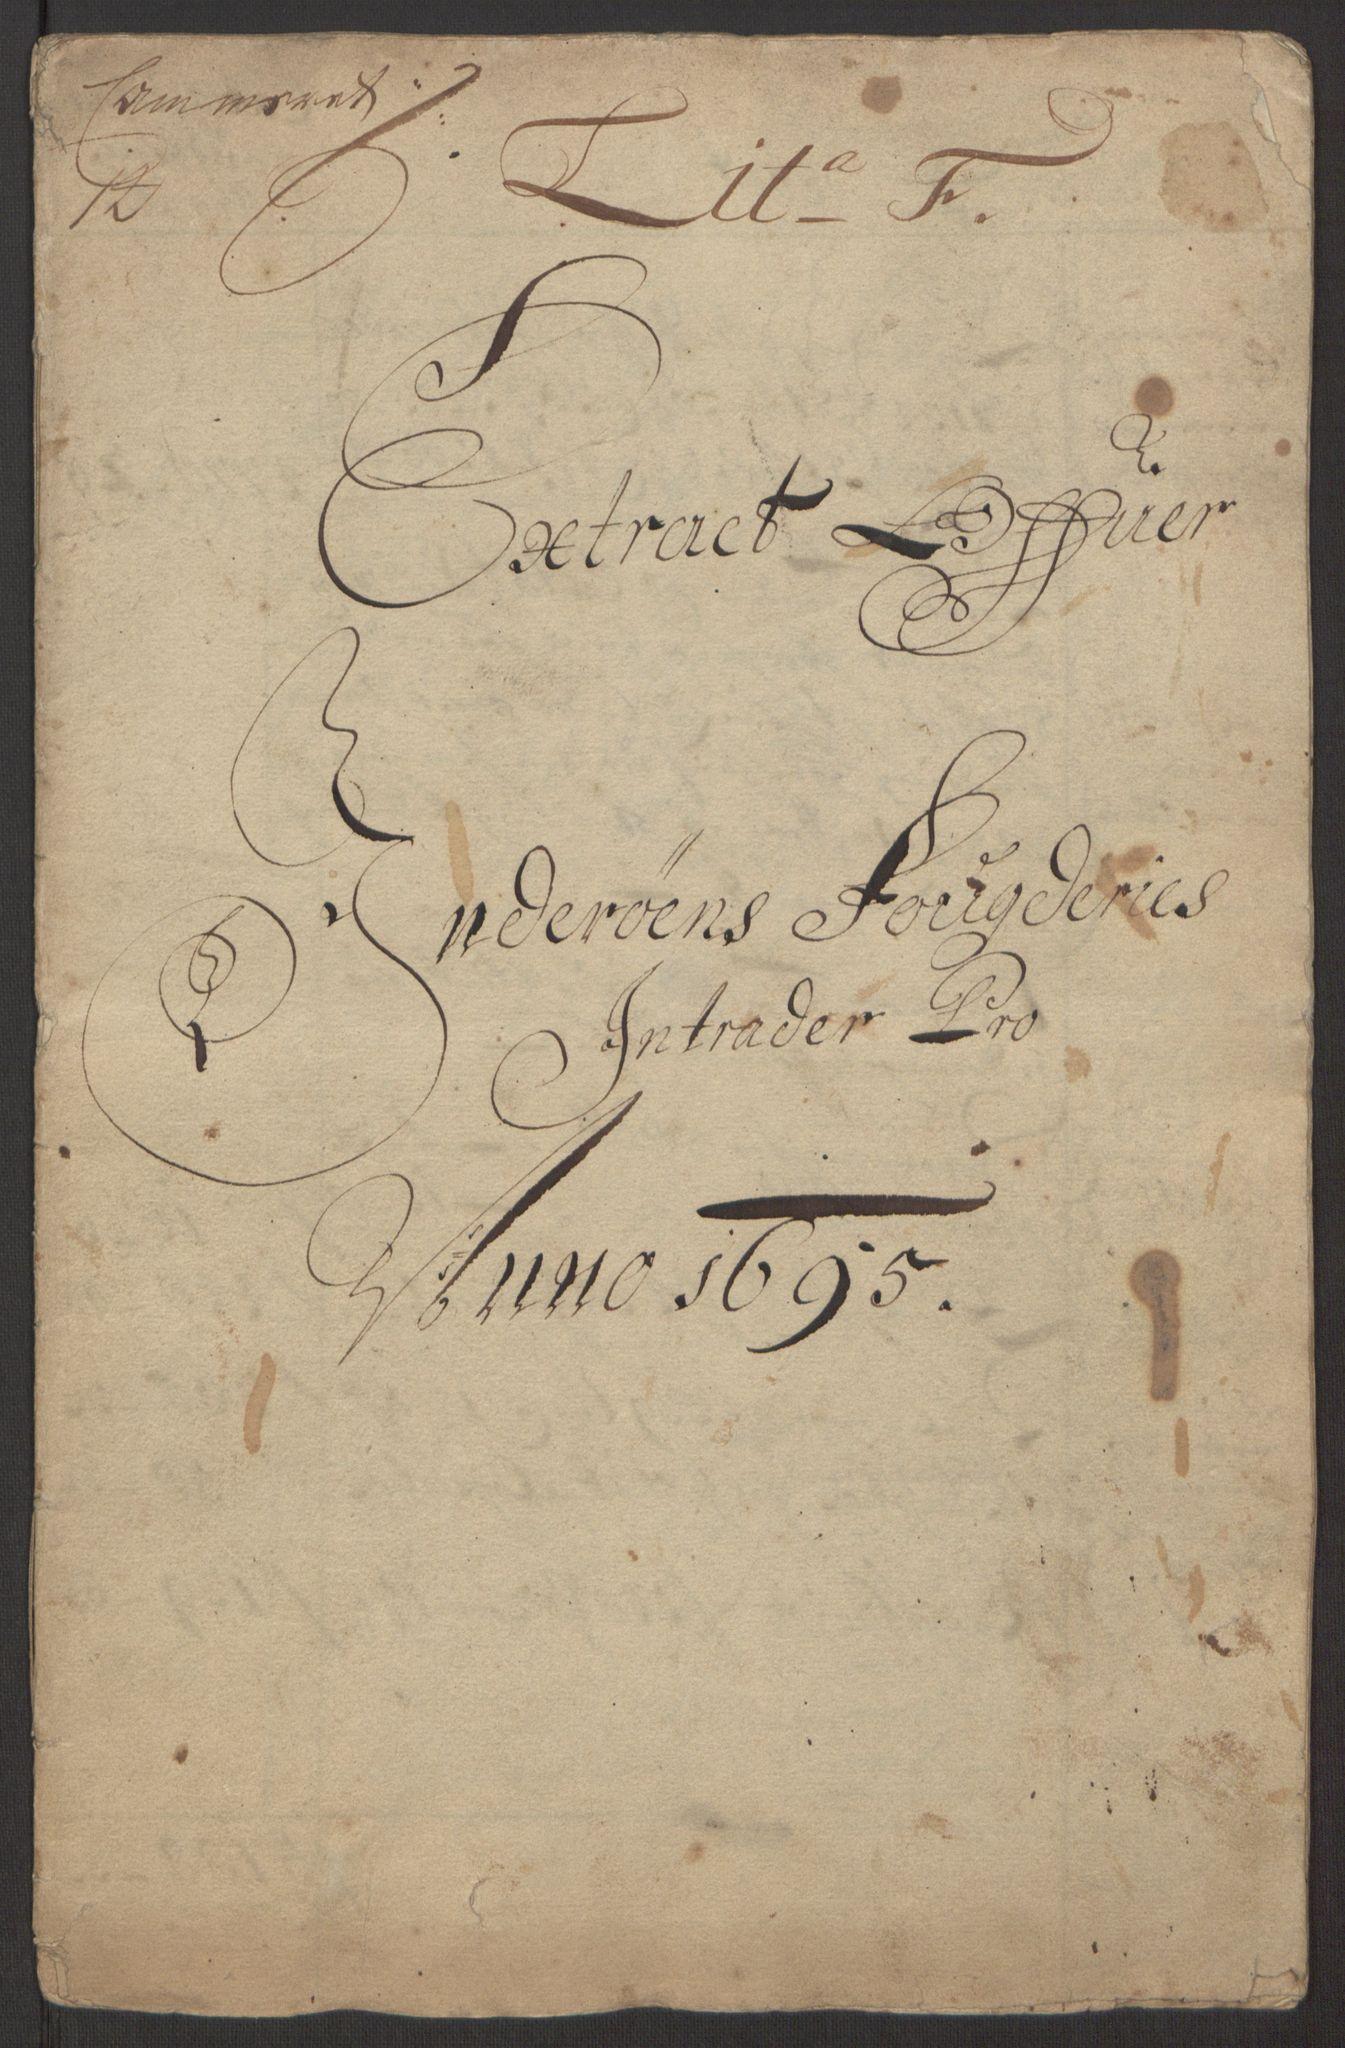 RA, Rentekammeret inntil 1814, Reviderte regnskaper, Fogderegnskap, R63/L4309: Fogderegnskap Inderøy, 1695-1697, s. 4